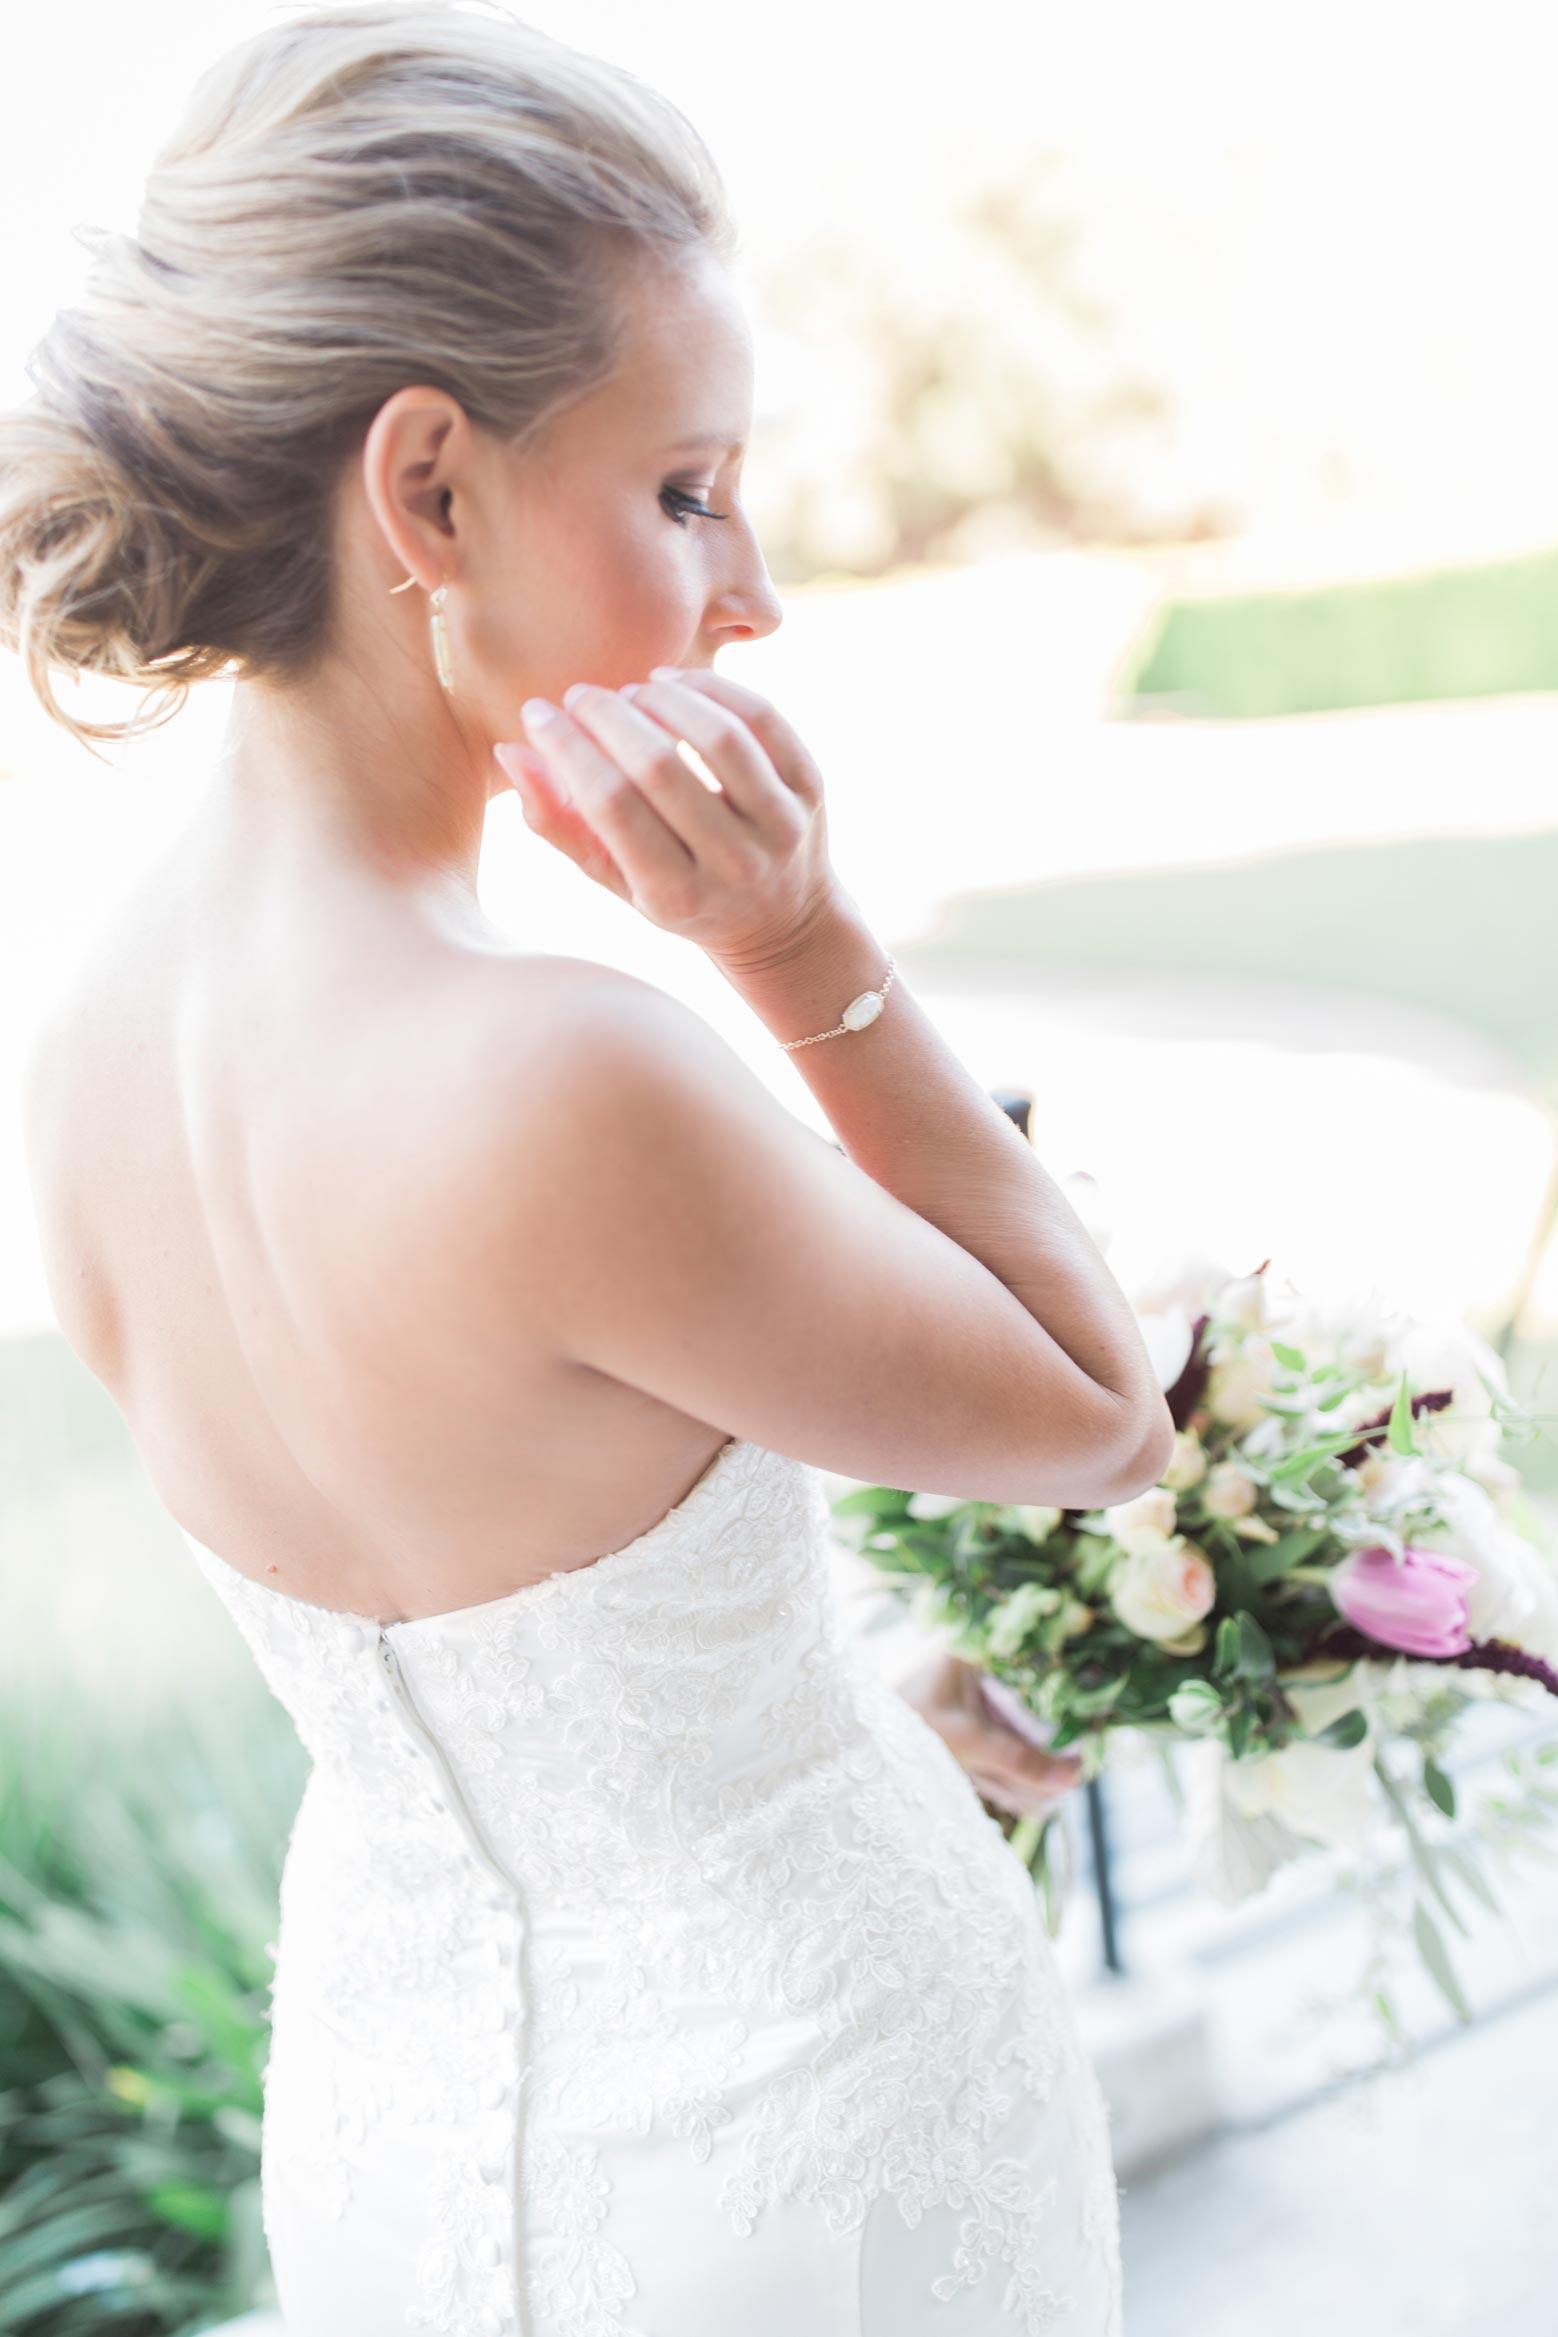 orange-county-fine-art-wedding-photographer-leah-vis-14.jpg